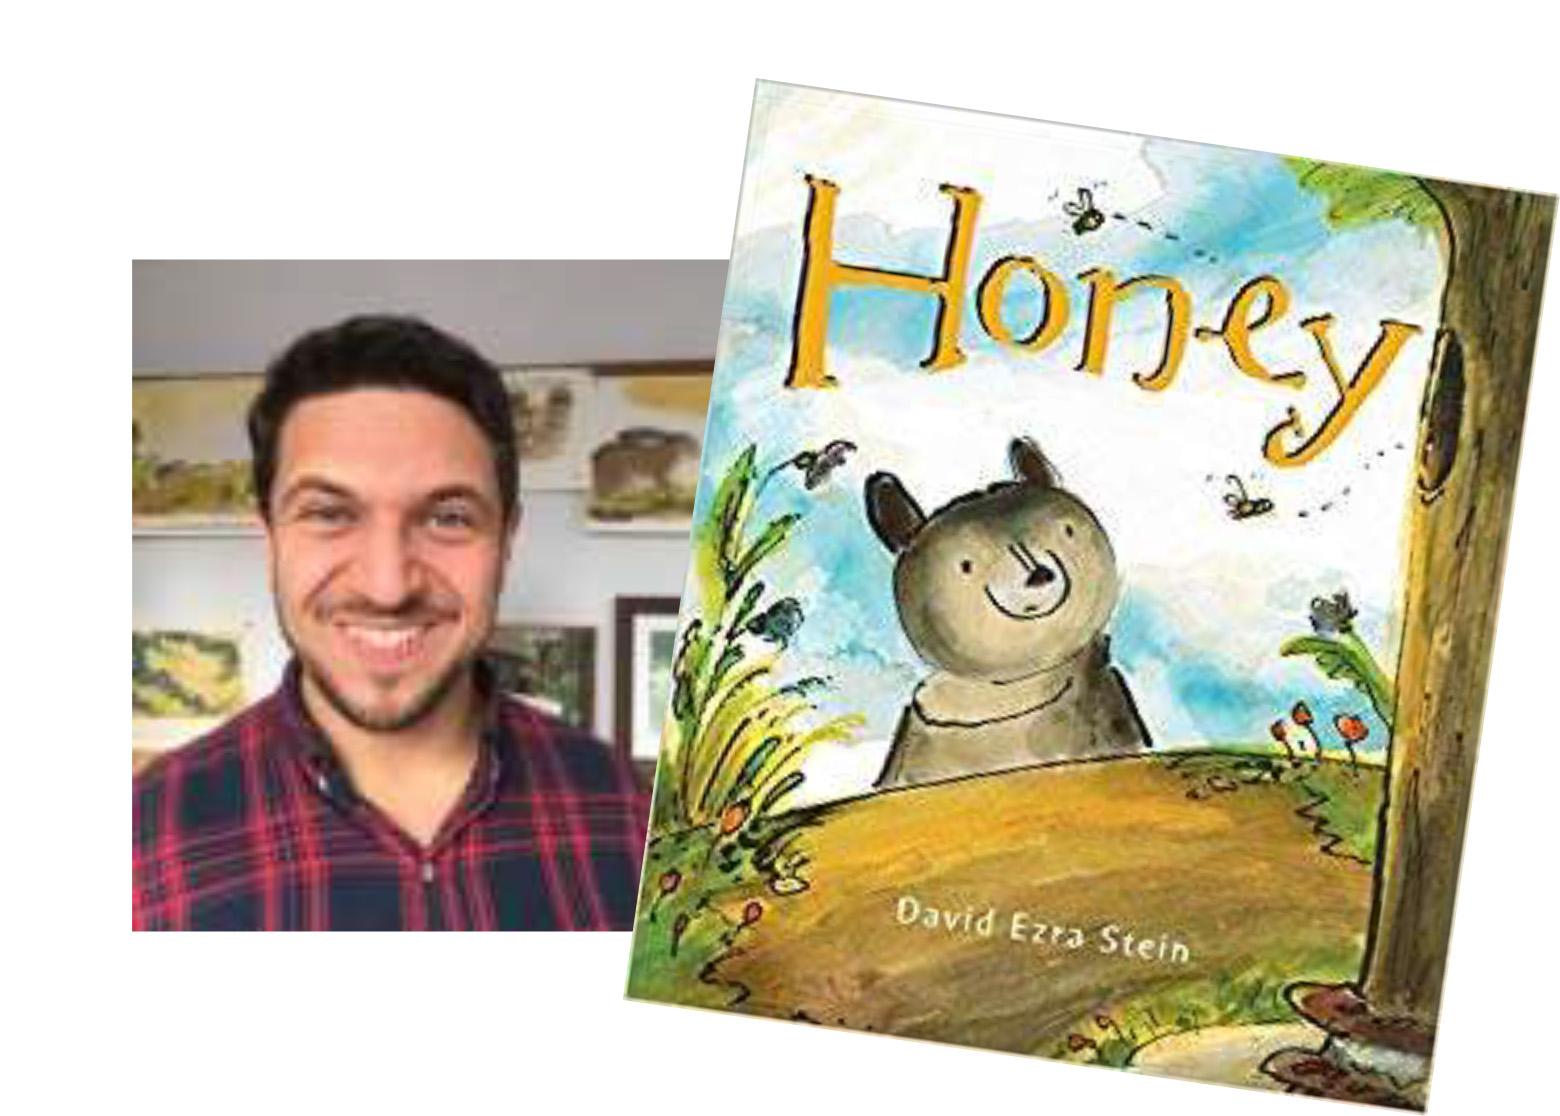 David Ezra Stein and Honey cover